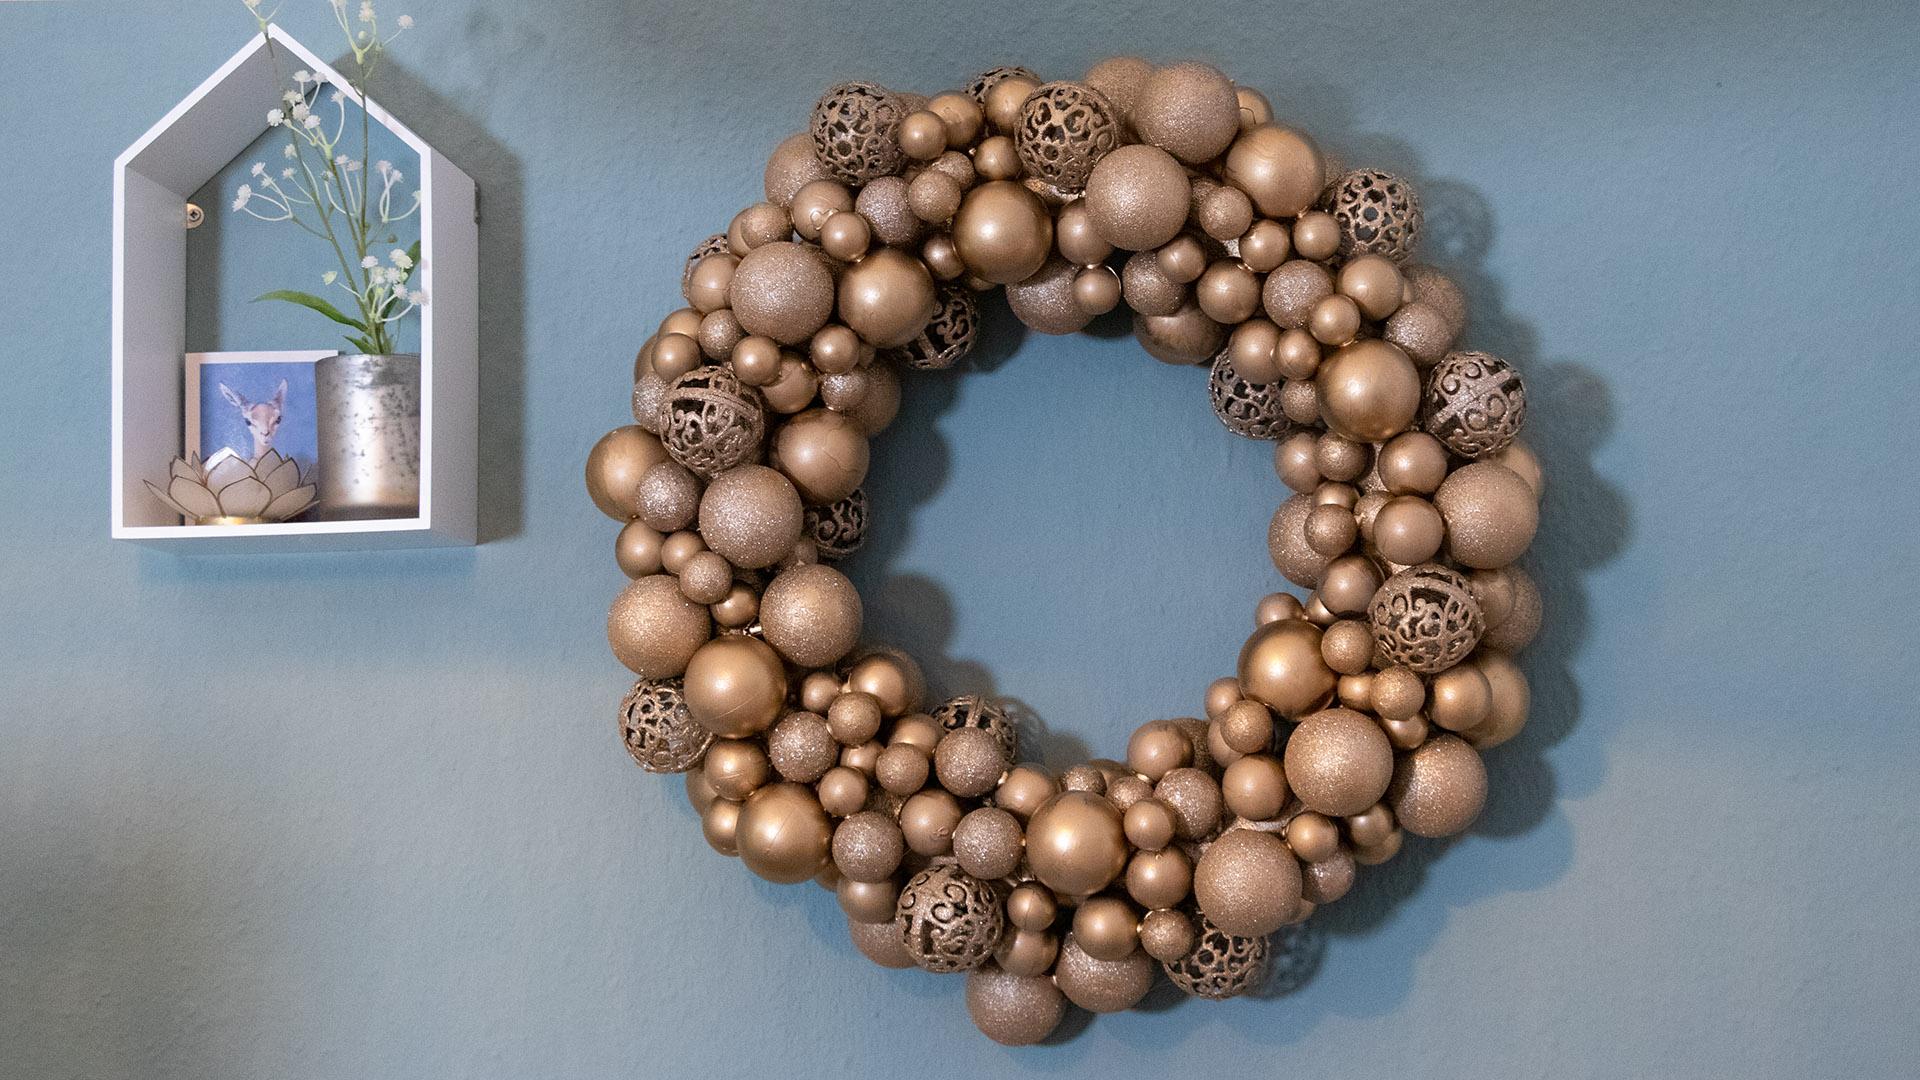 letters-and-beads-diy-weihnachtskranz-basteln-upcycling-weihnachtskugeln-header